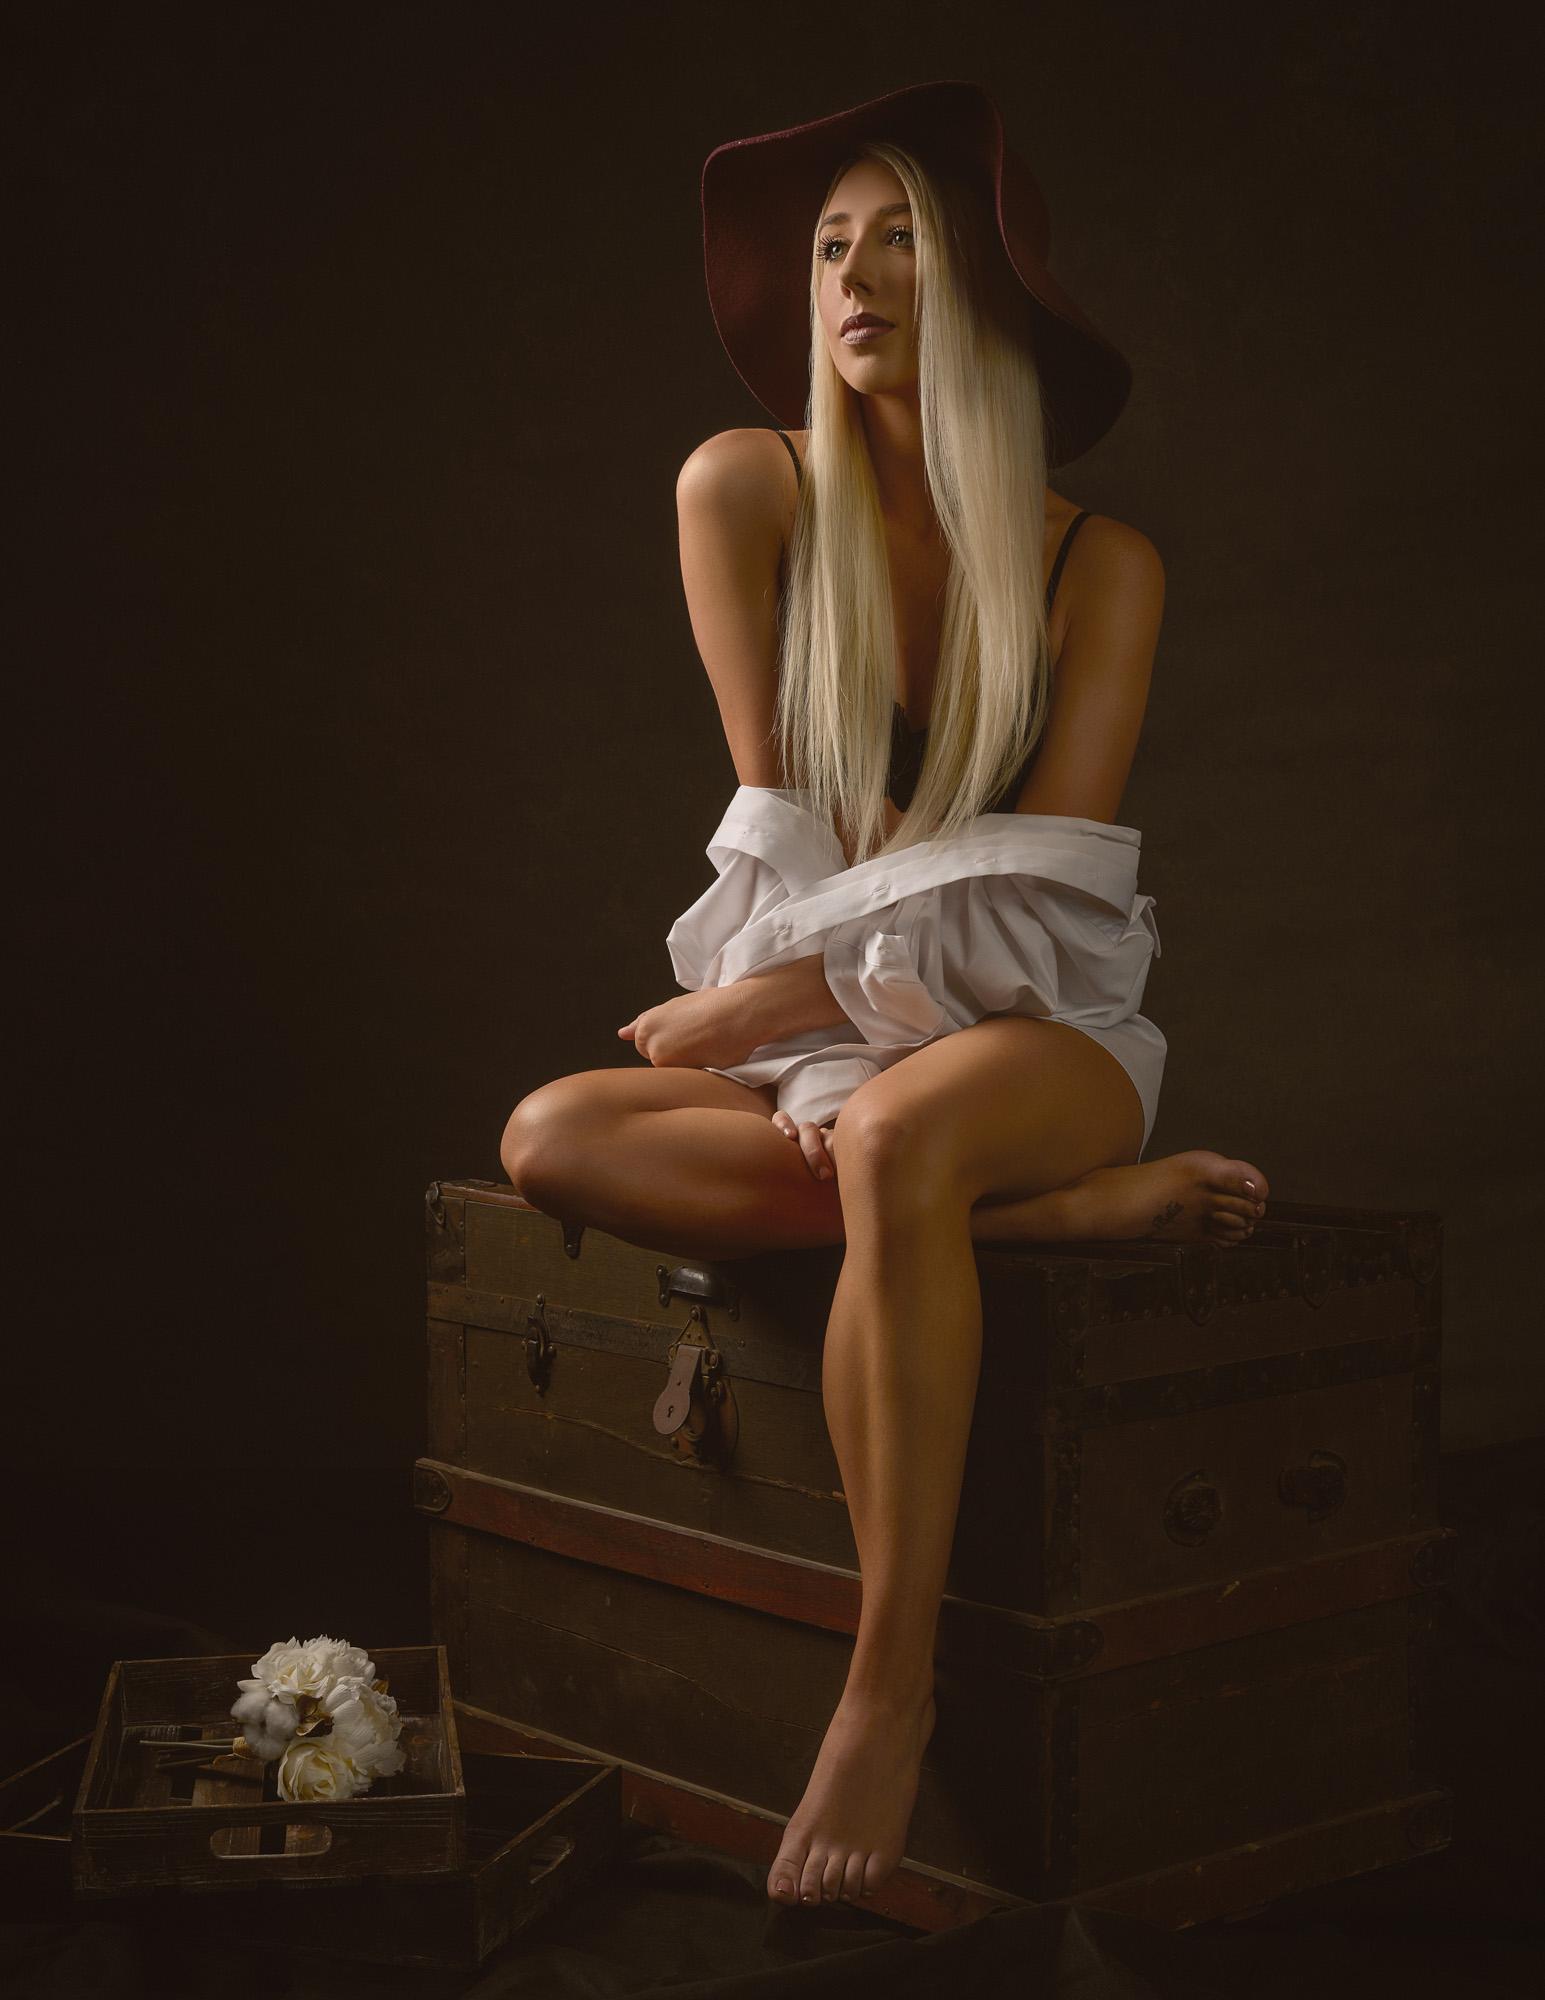 Arizona Glamour Model Ashlyn by Arizona Portrait Photographer Chad Weed